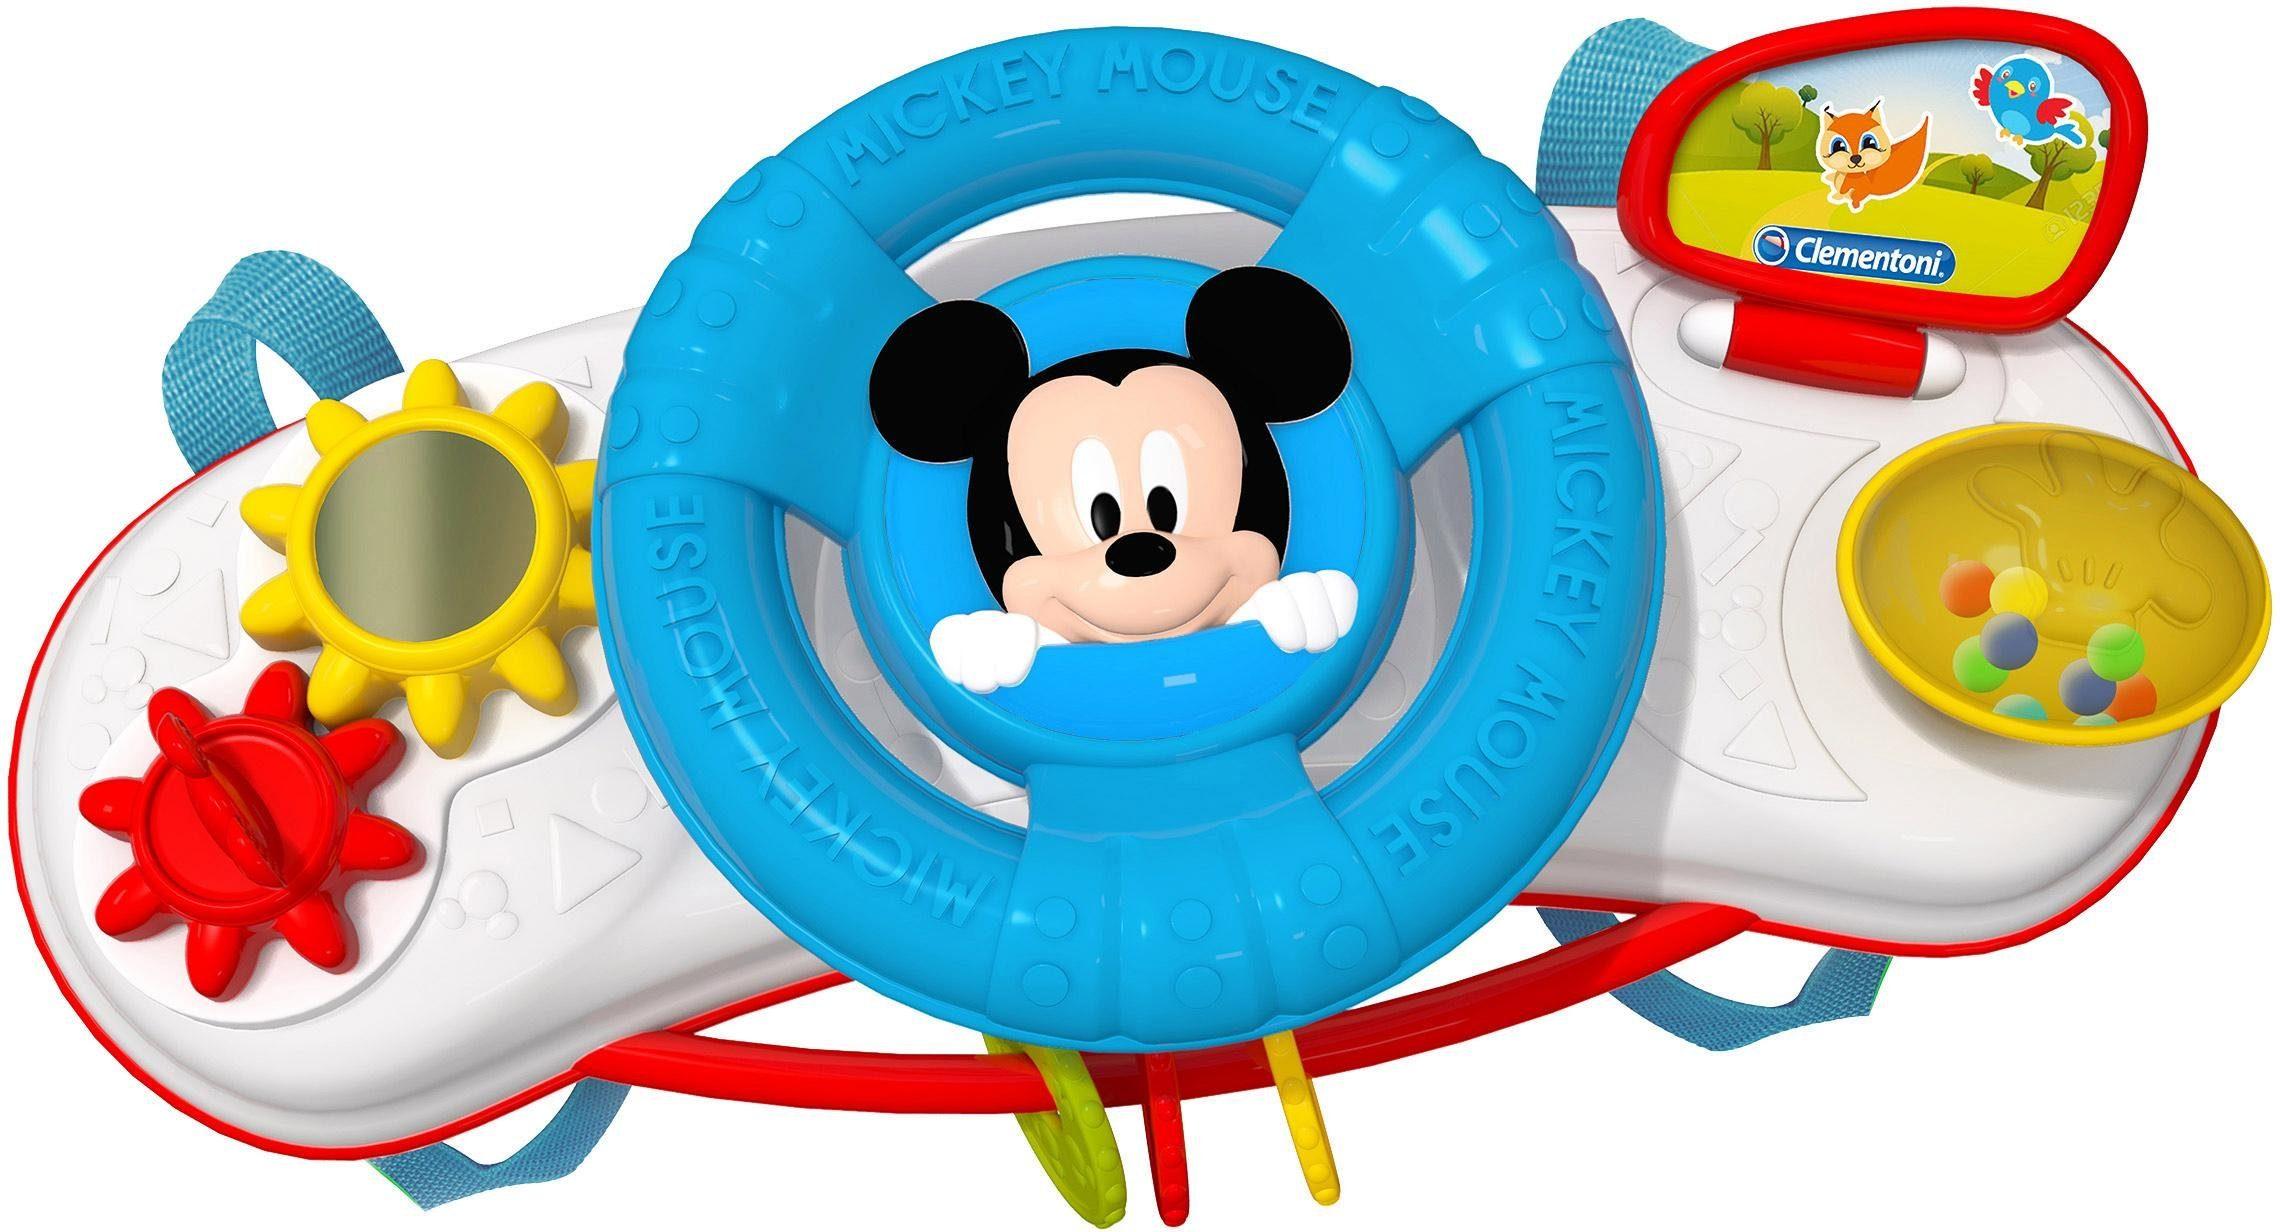 Clementoni Kinderwagenkette, »Disney Baby Mickey Kinderwagen Activity Center«